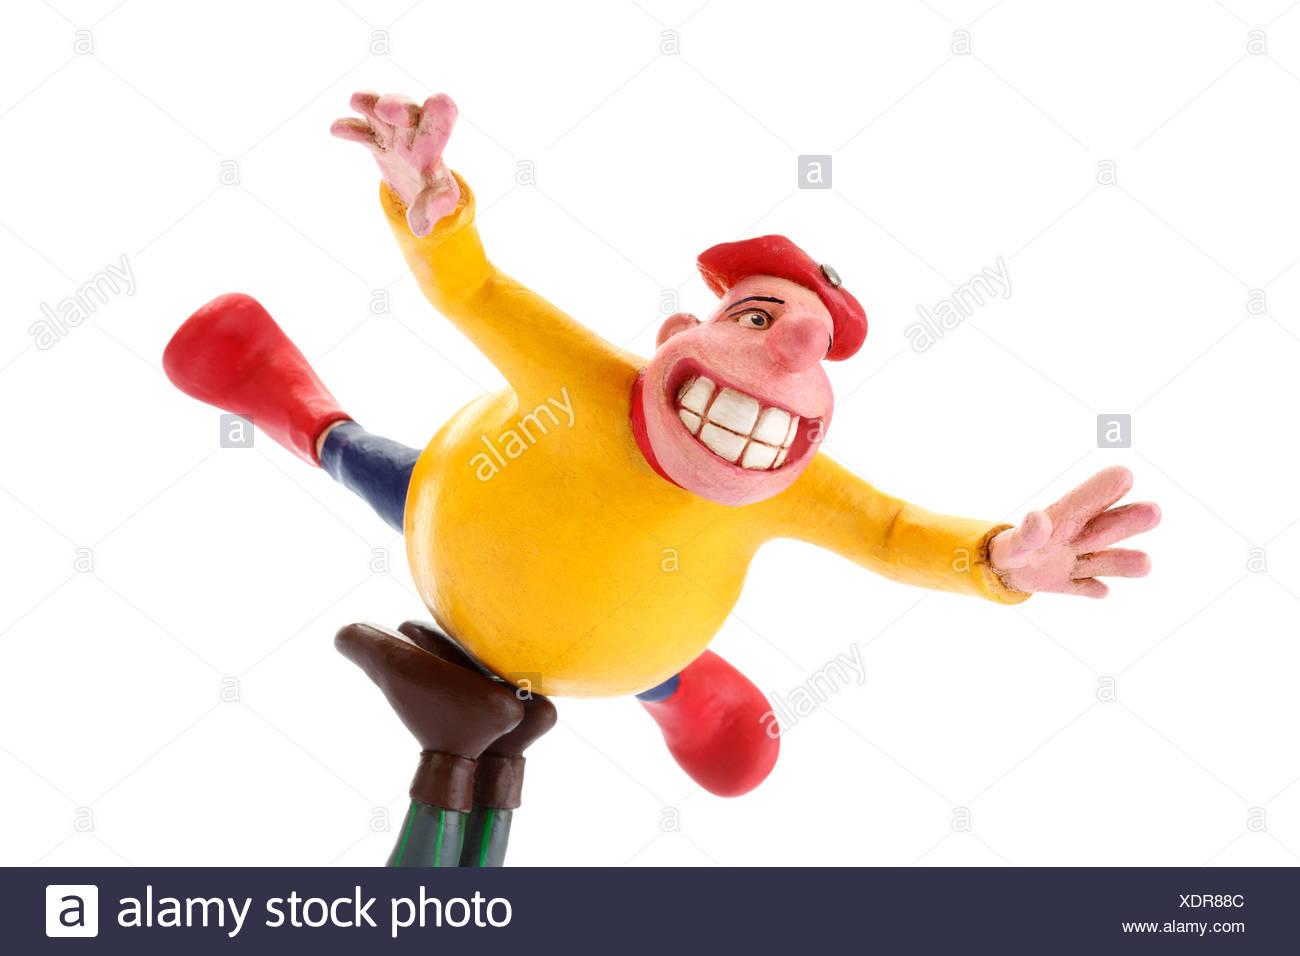 Fool, fat man in free fall, cartoon character - Stock Image